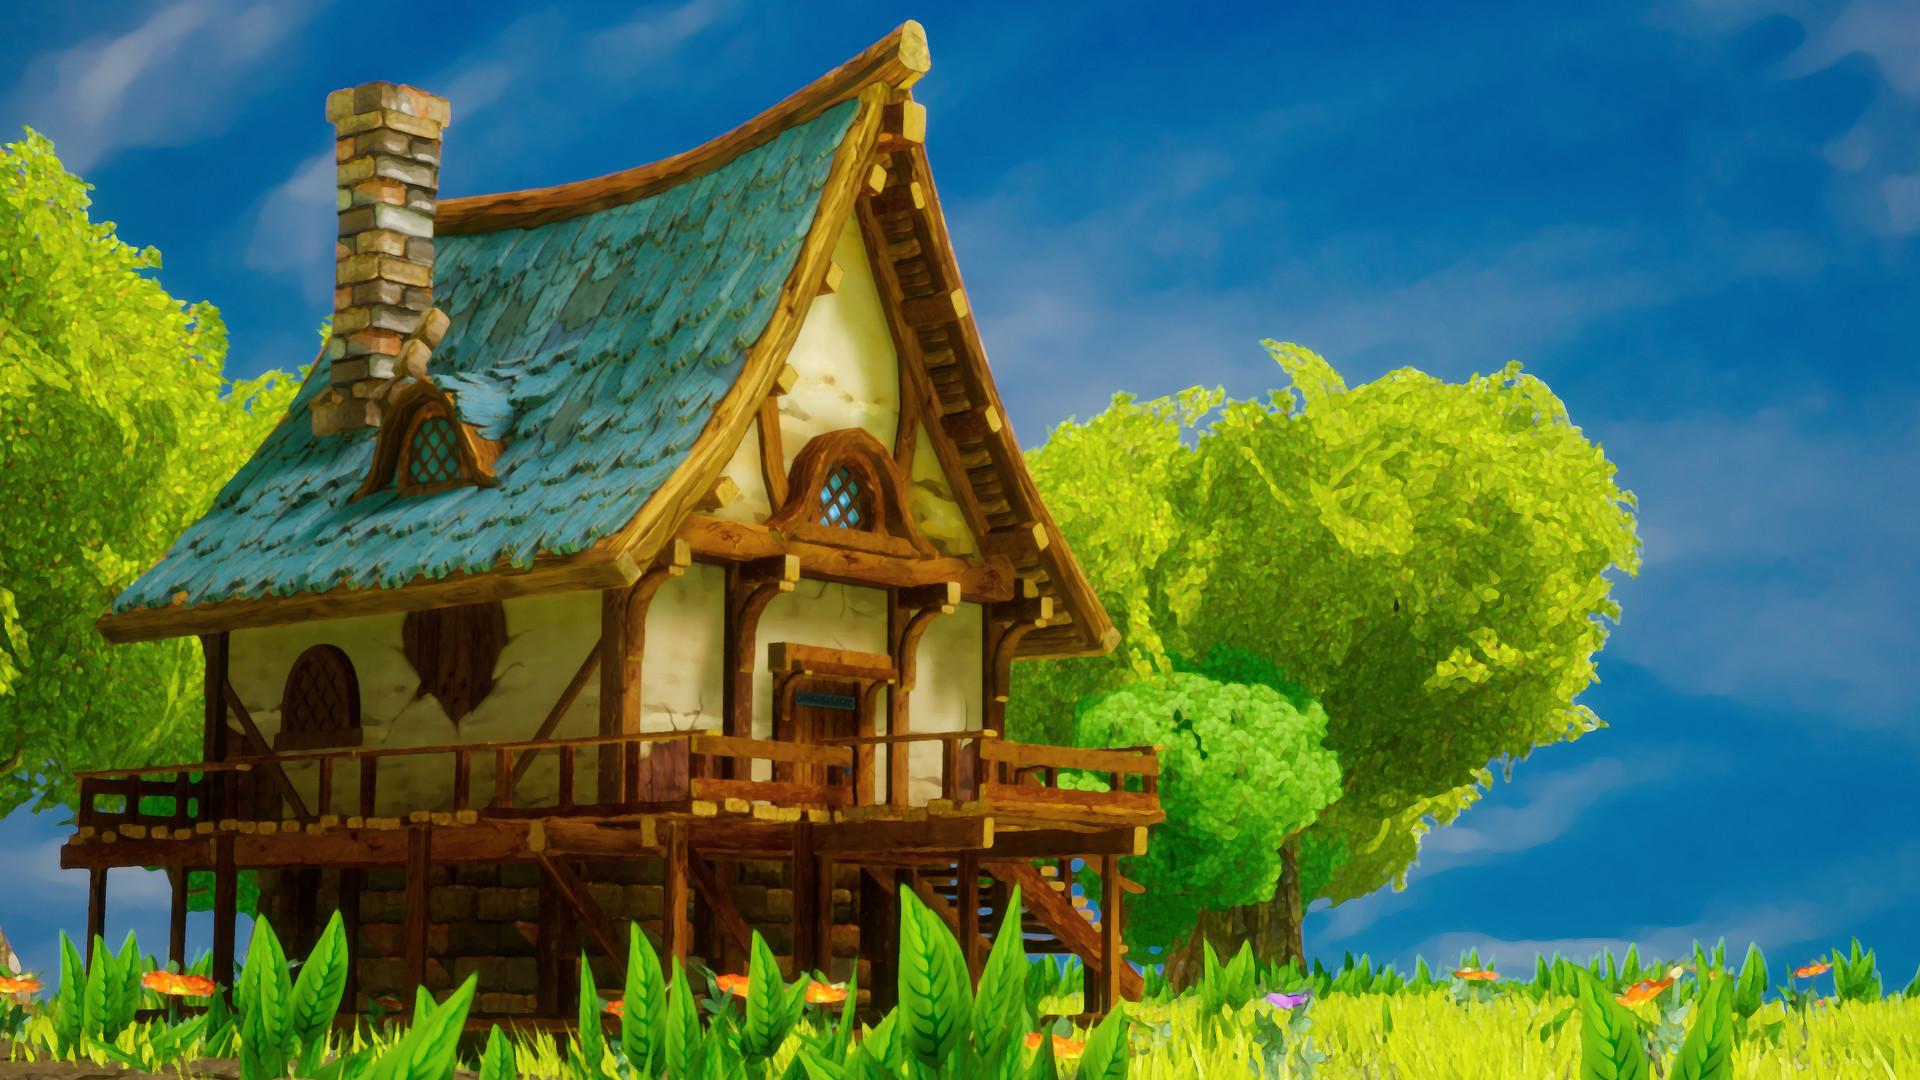 ArtStation - Unreal Engine 4 stylized environment rendering